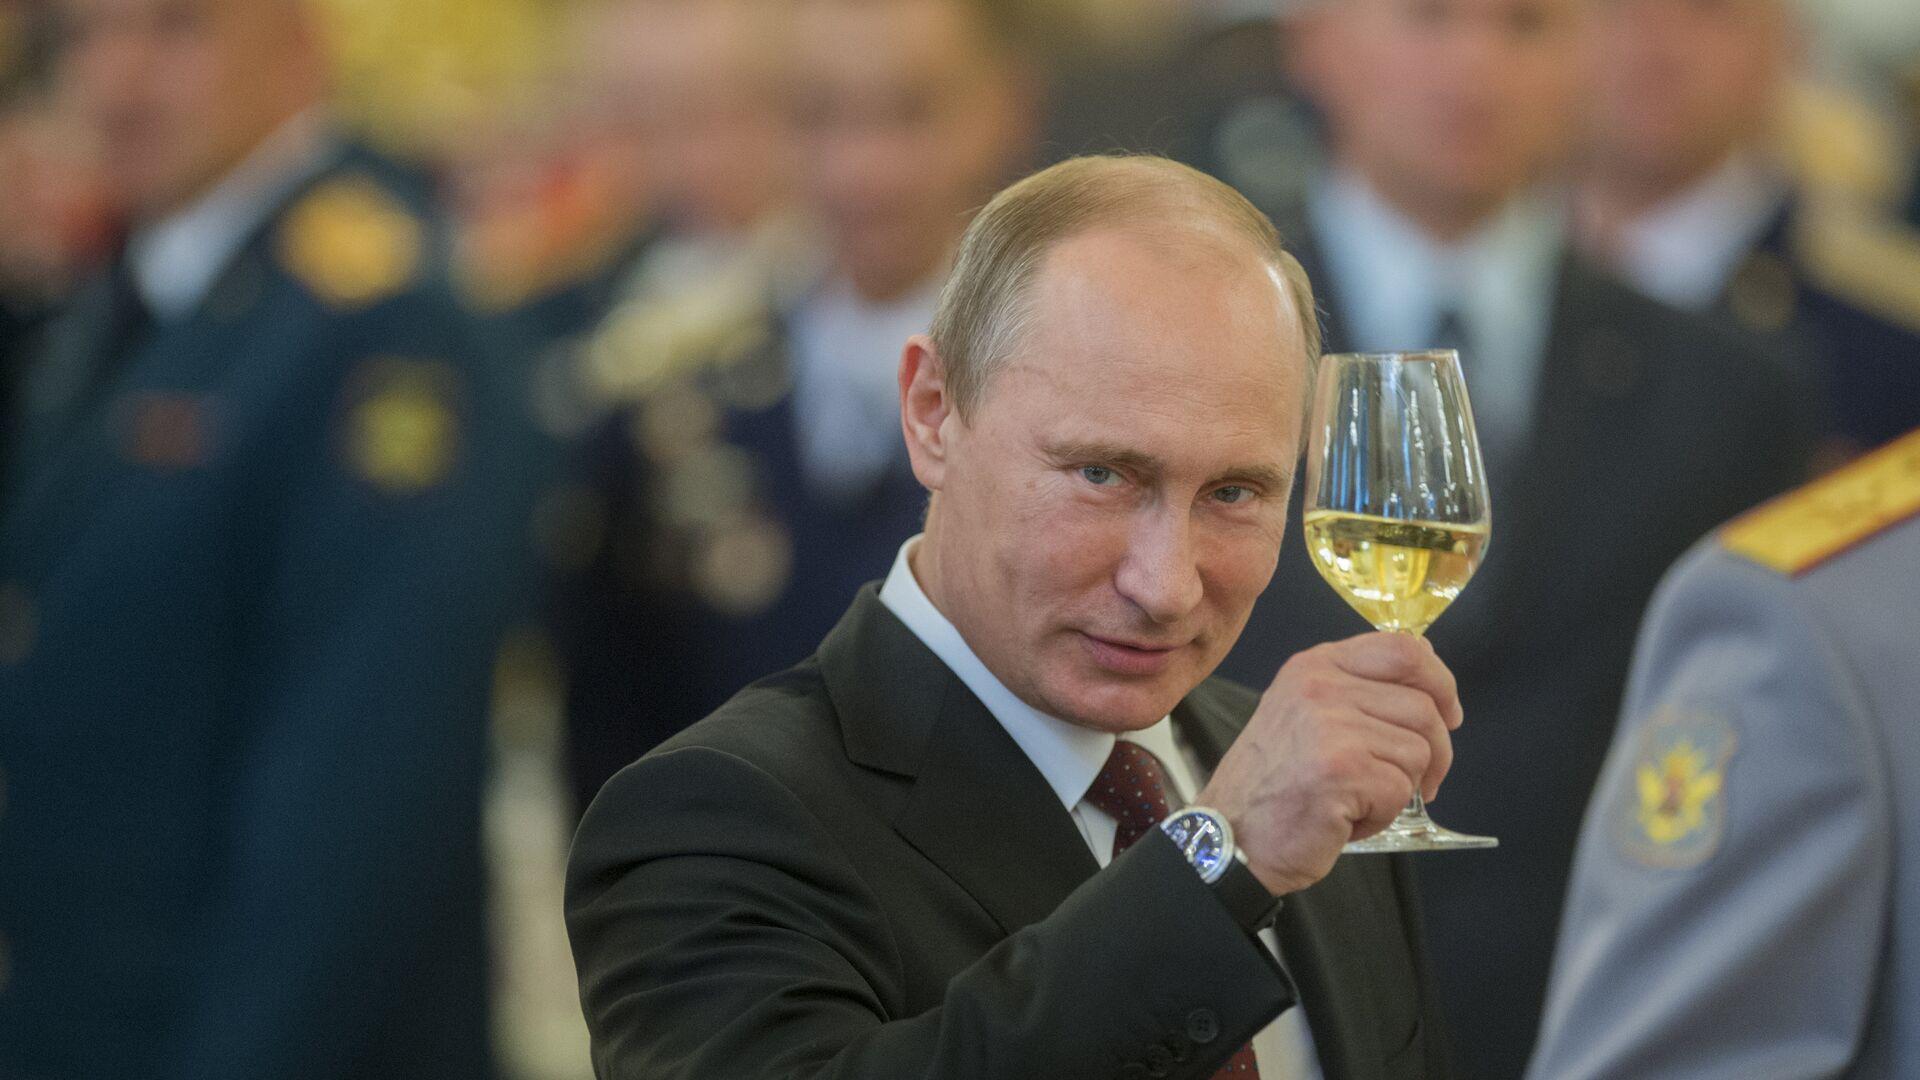 Putin z szampanem - Sputnik Polska, 1920, 23.06.2021